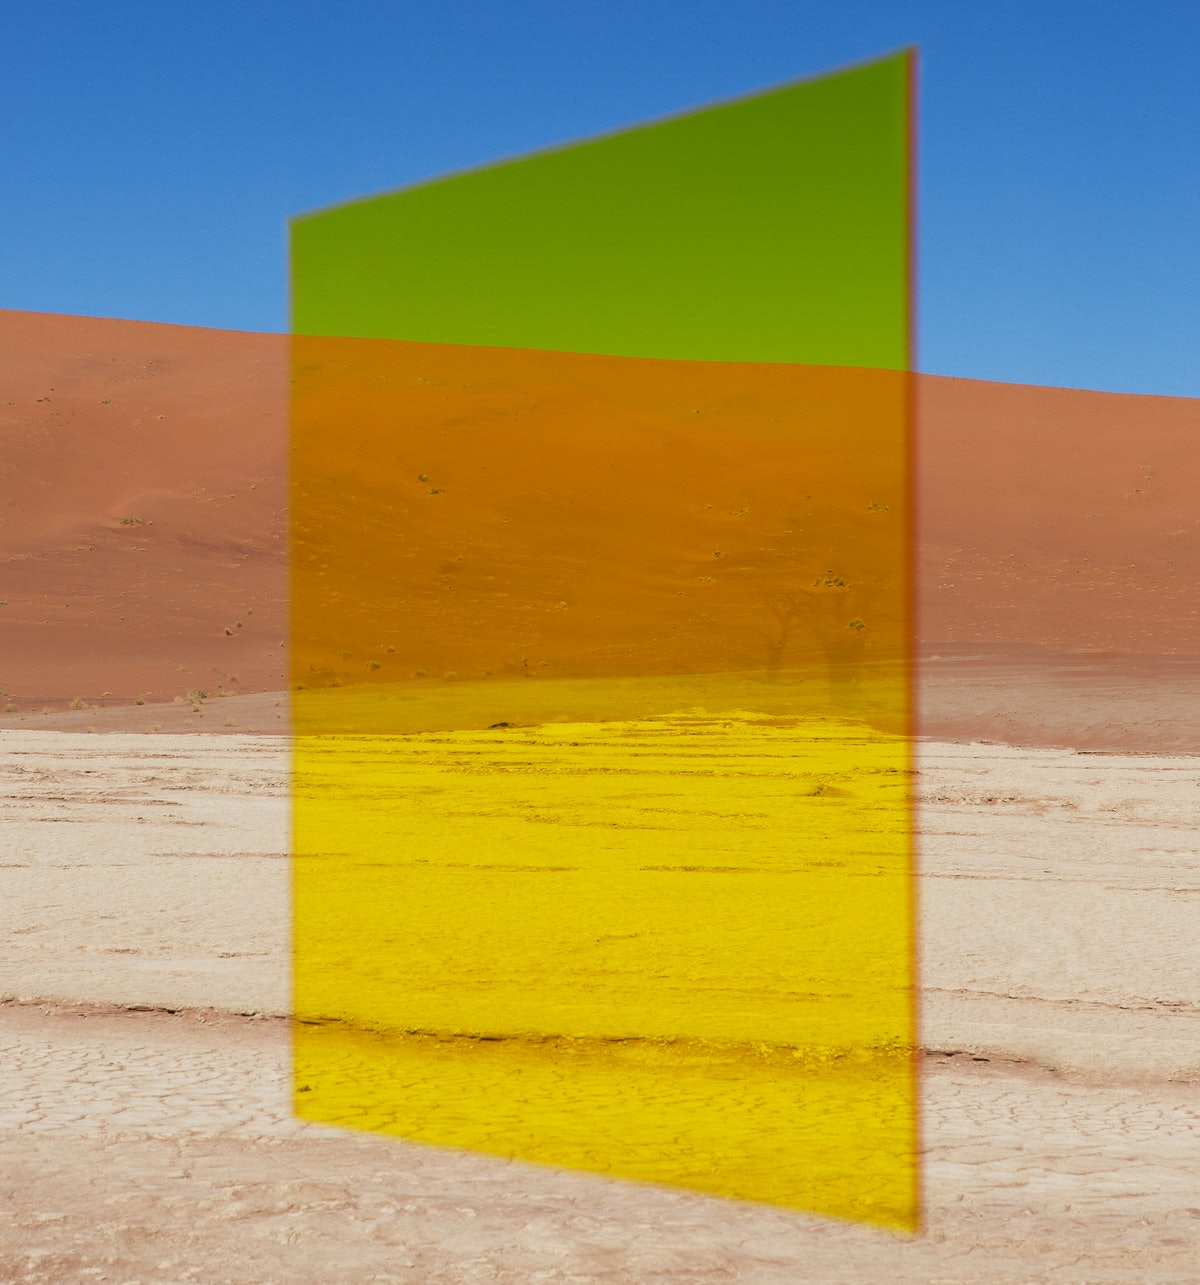 YellowVlei.jpg